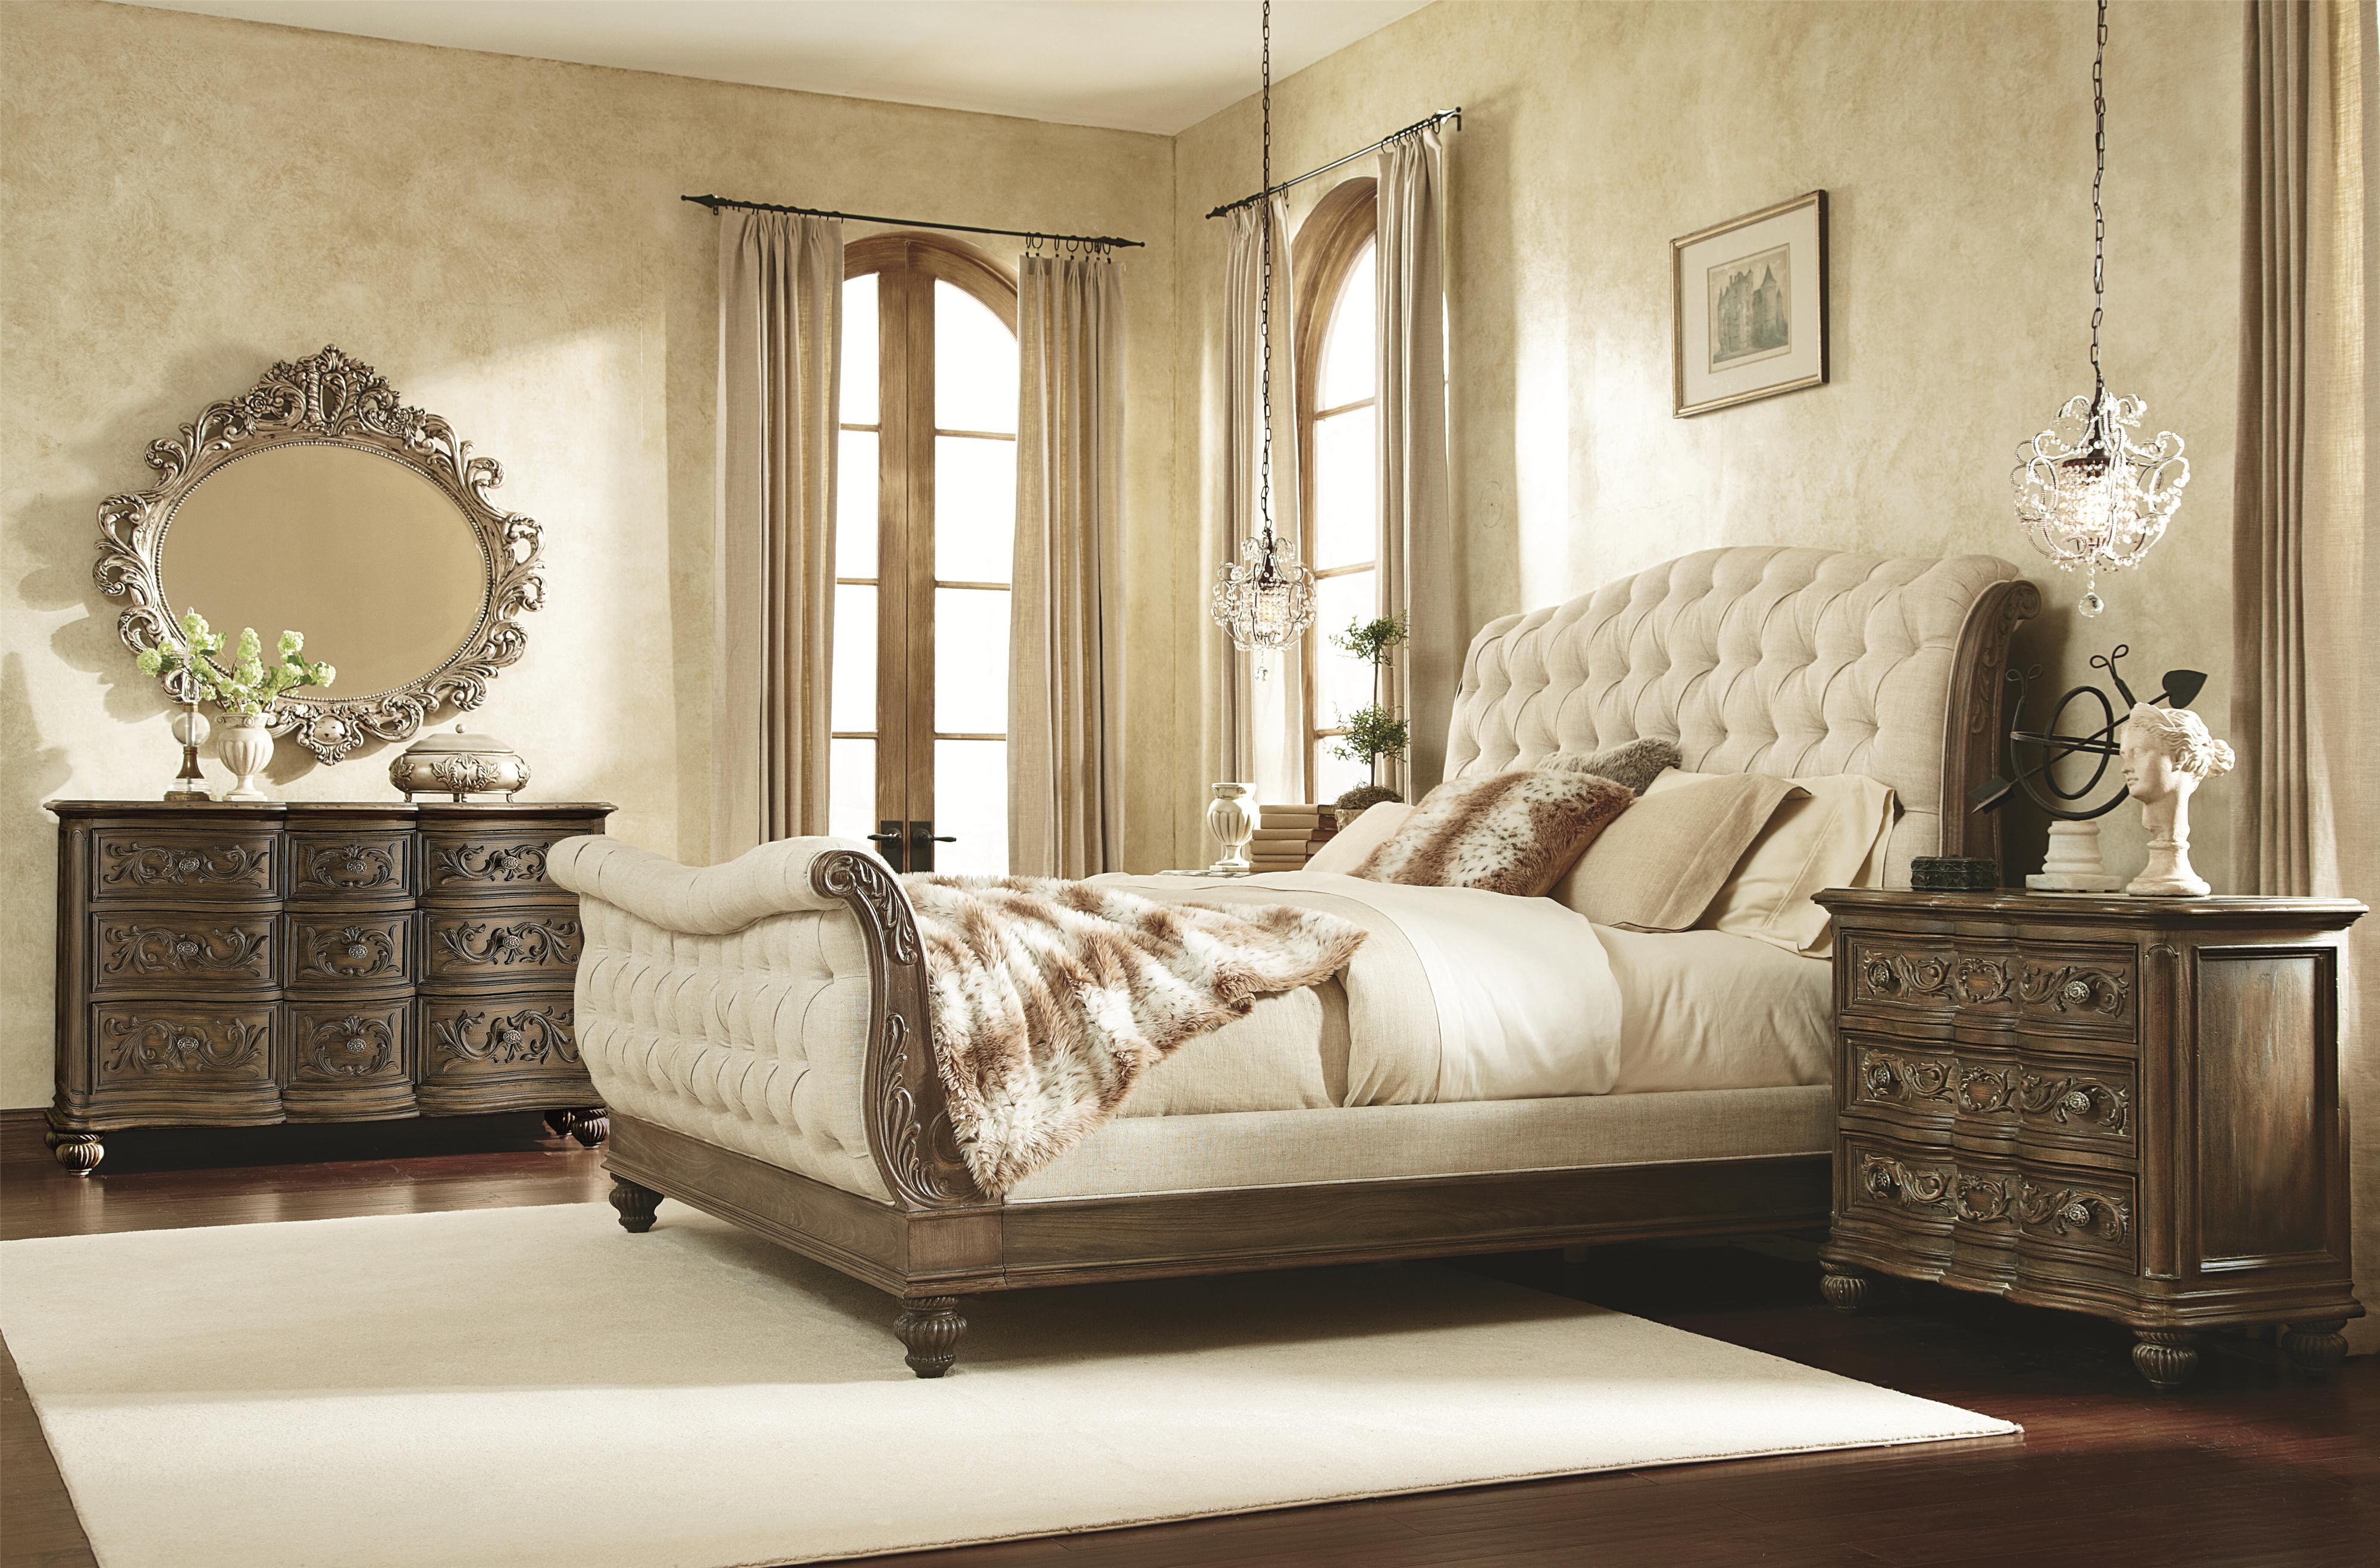 jessica mcclintock bedroom